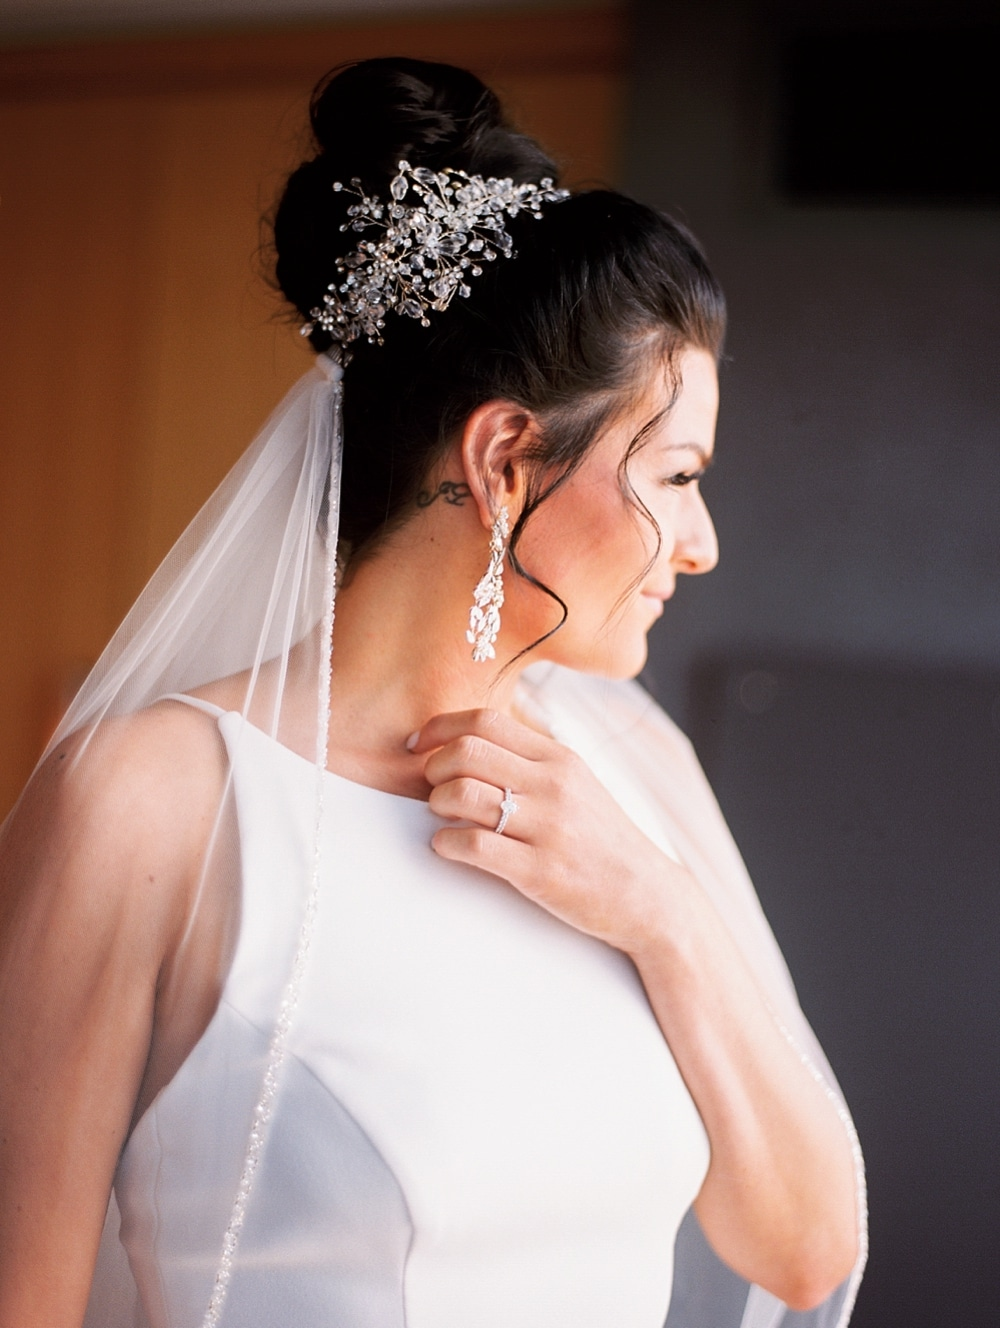 Kristin-La-Voie-Photography-chicago-wedding-photographer-108